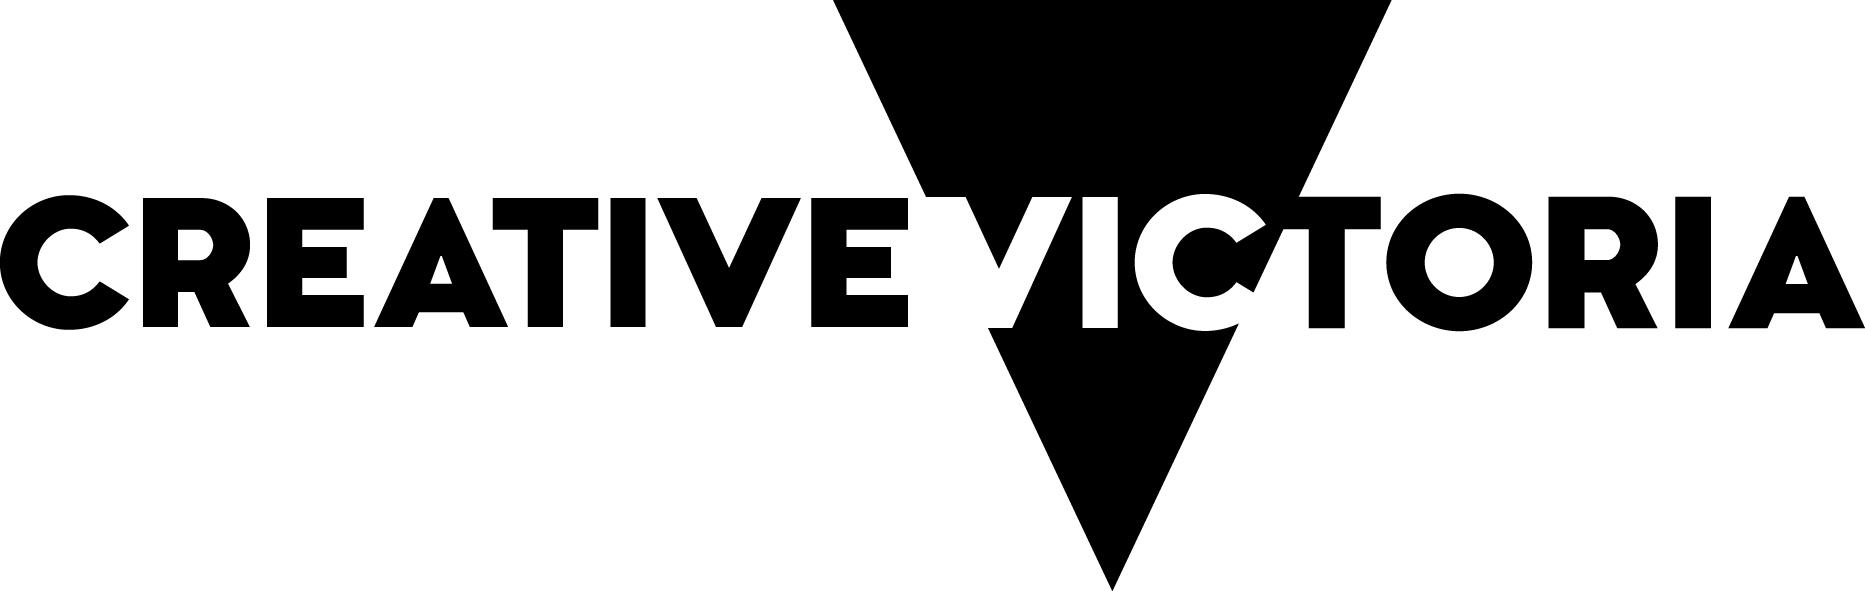 CreativeVictoriaLogo_Positive.jpg